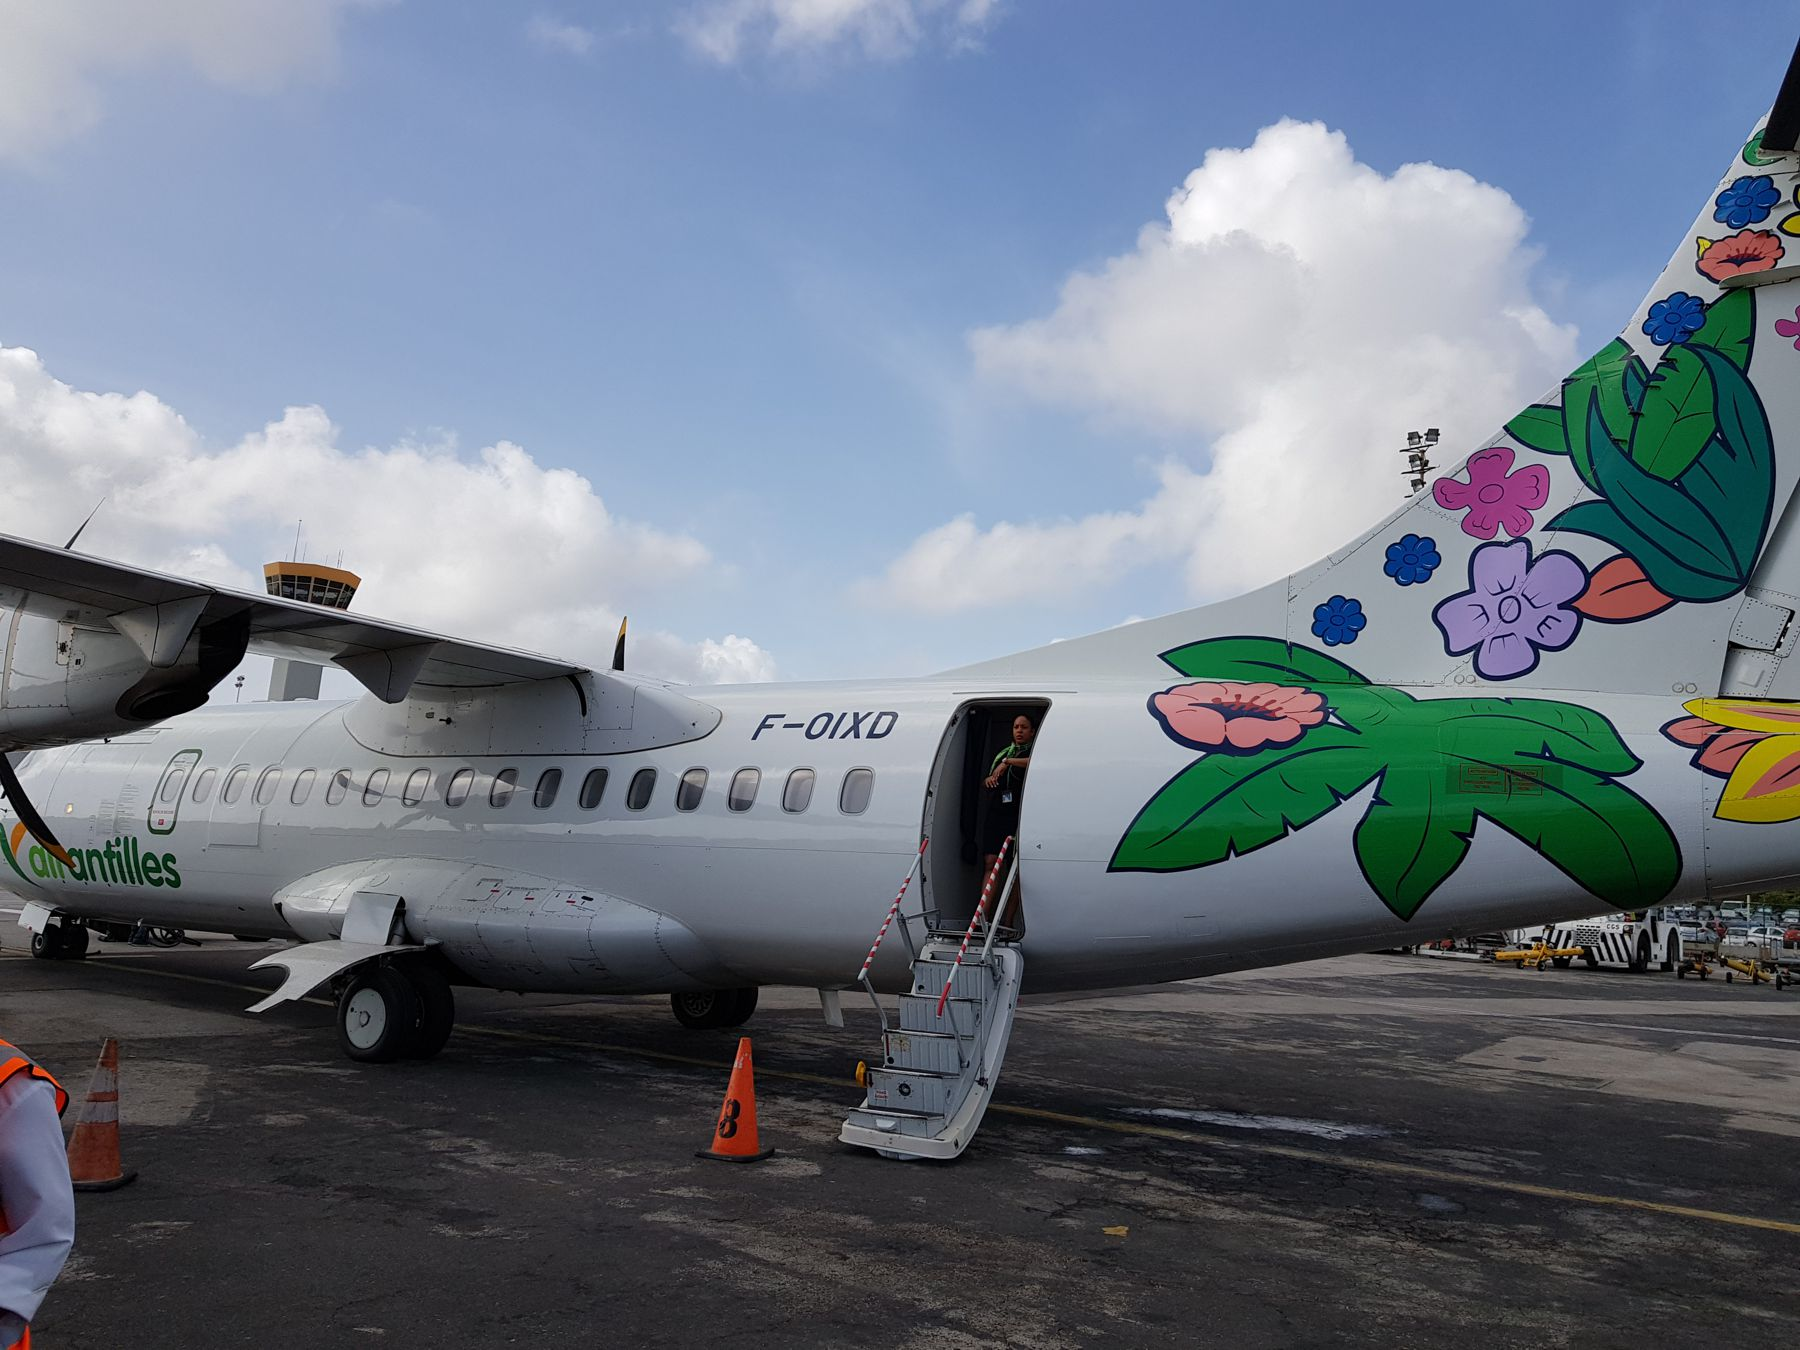 Air Antilles in Curacao foto HL